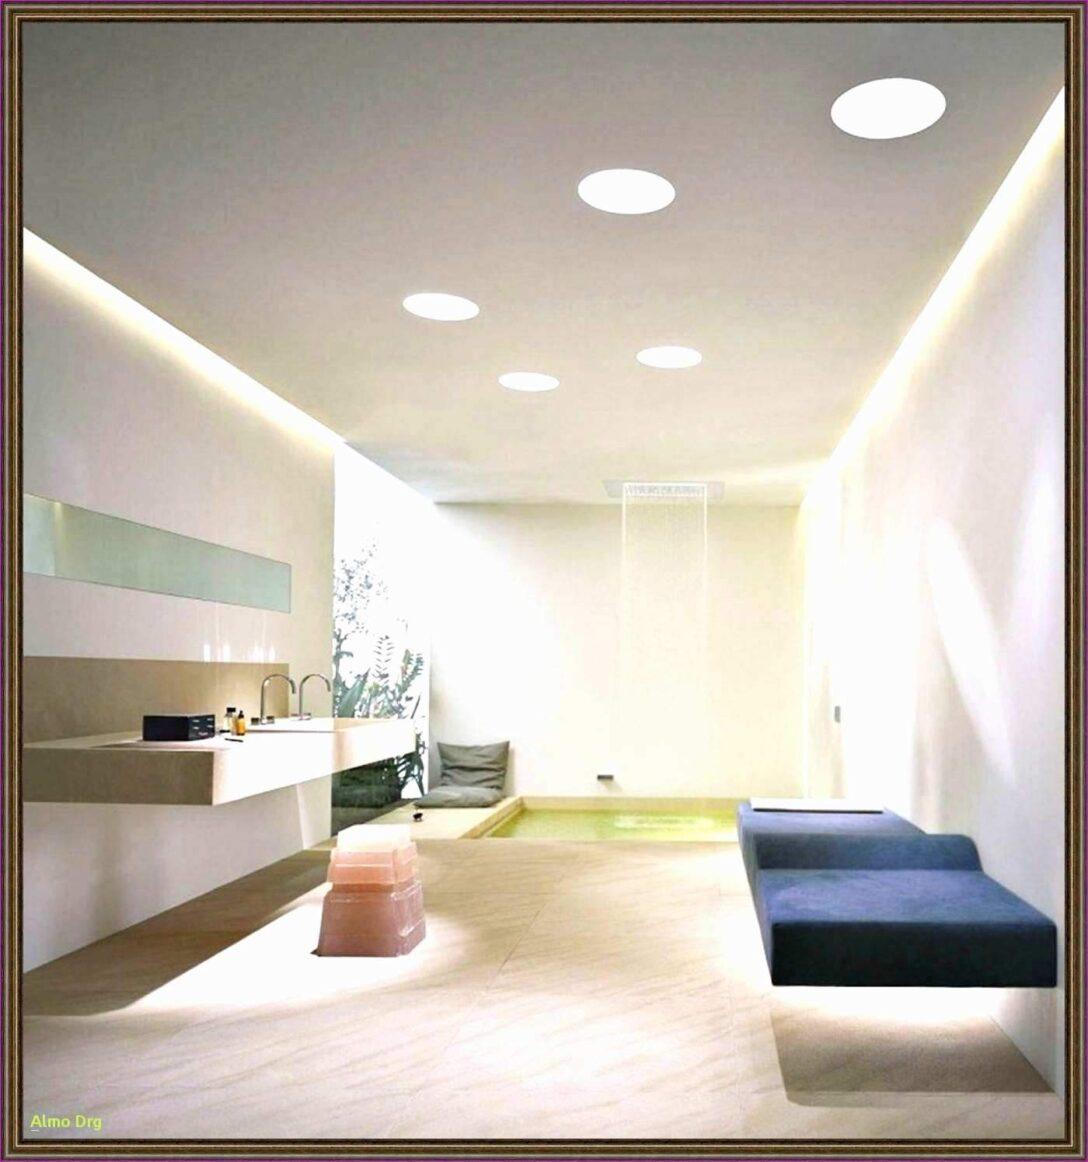 Large Size of Wohnzimmer Led Lampe Moderne Lampen Inspirierend Tapete Deckenleuchte Schlafzimmer Sessel Spiegellampe Bad Wandlampe Deko Landhausstil Deckenlampen Modern Spot Wohnzimmer Wohnzimmer Led Lampe